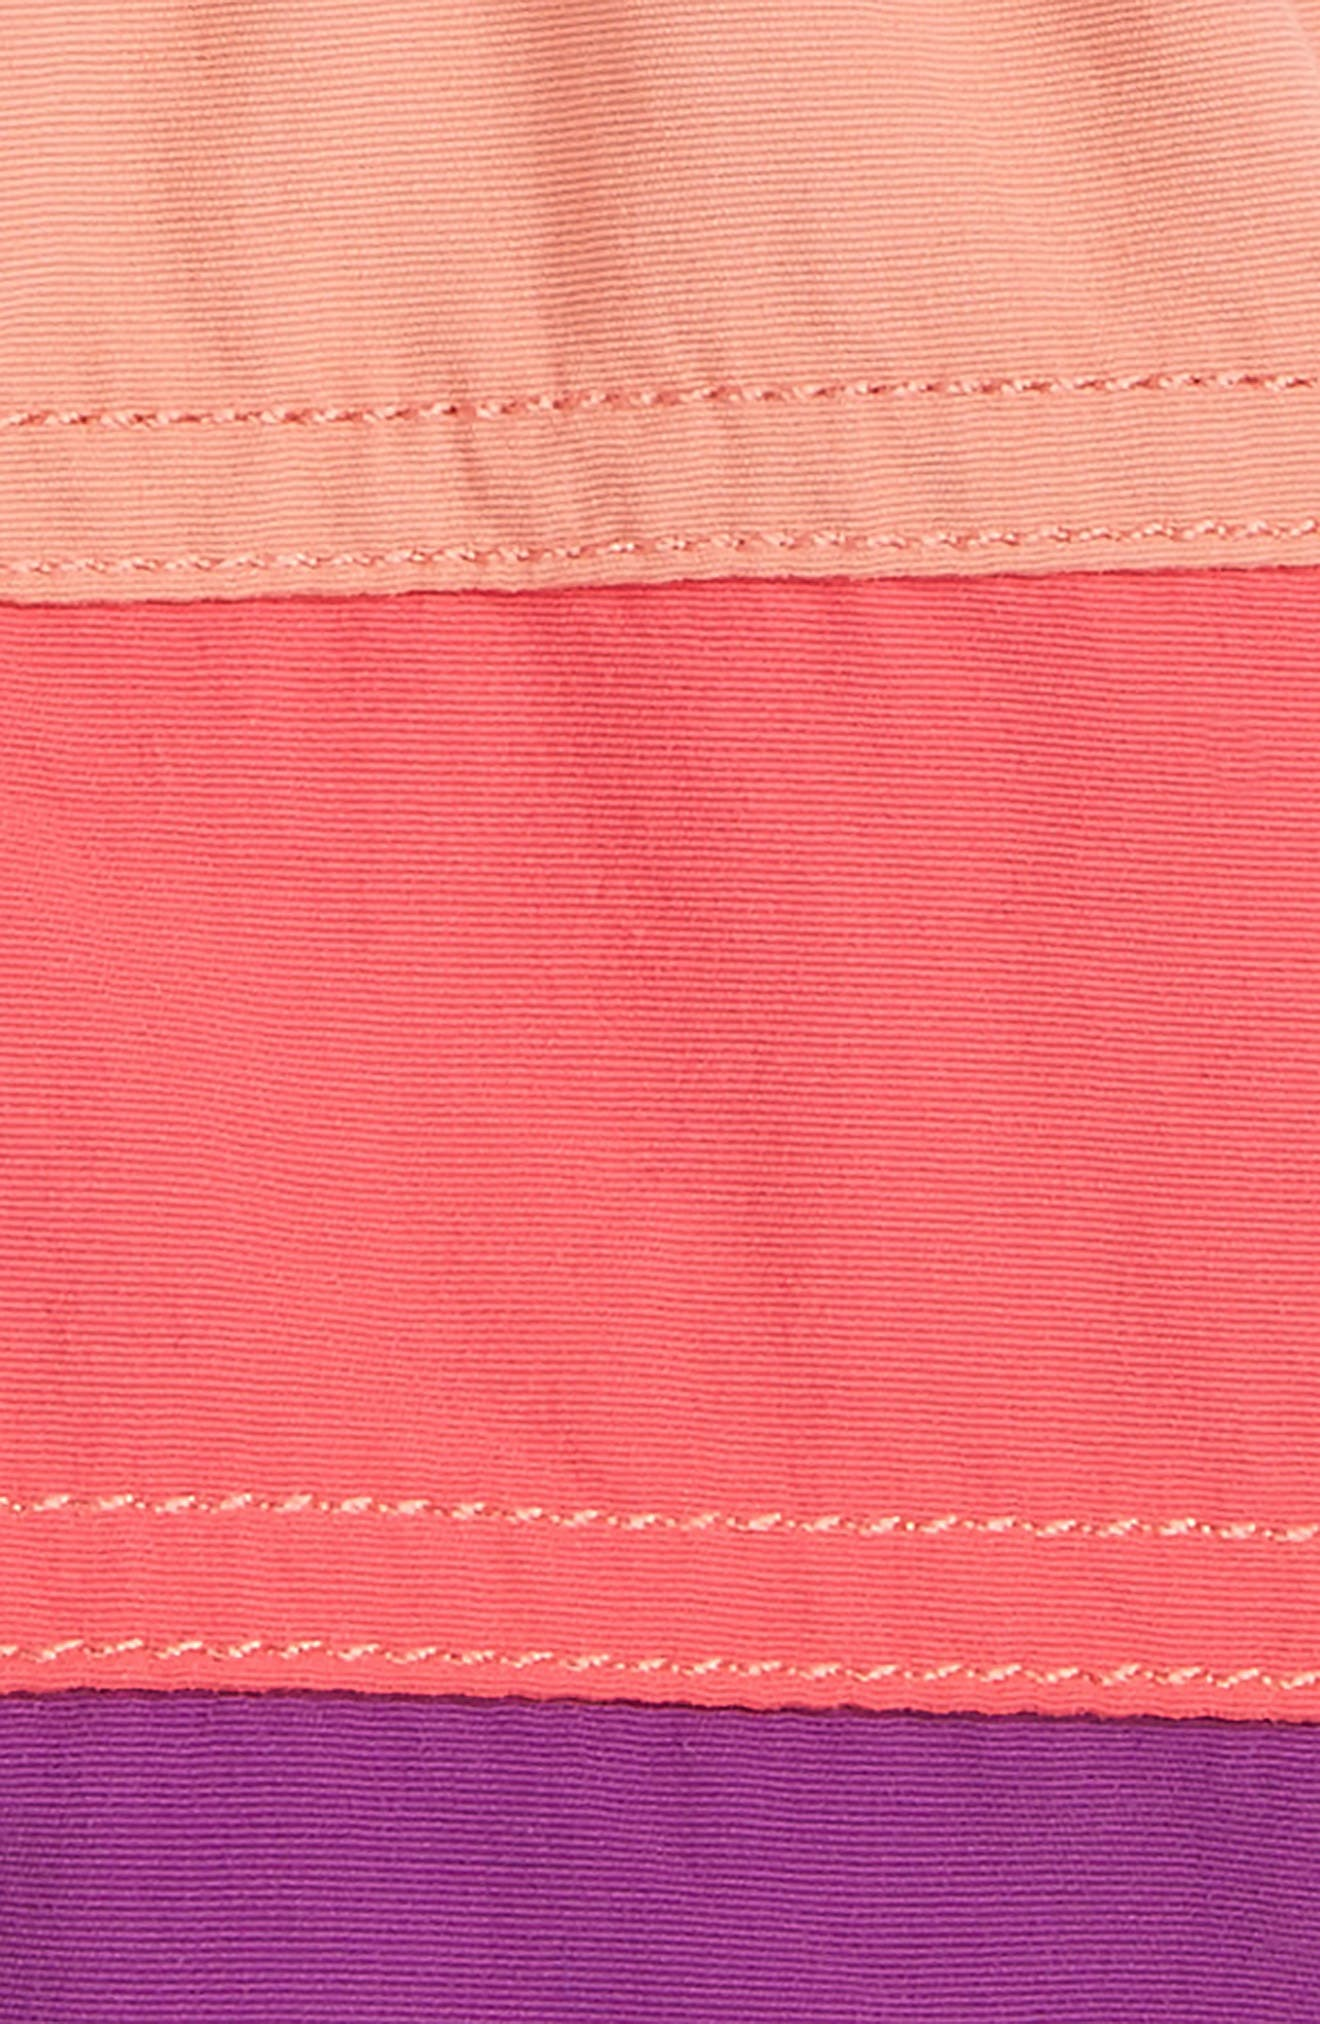 Board Shorts,                             Alternate thumbnail 2, color,                             Srap Sierra Pink